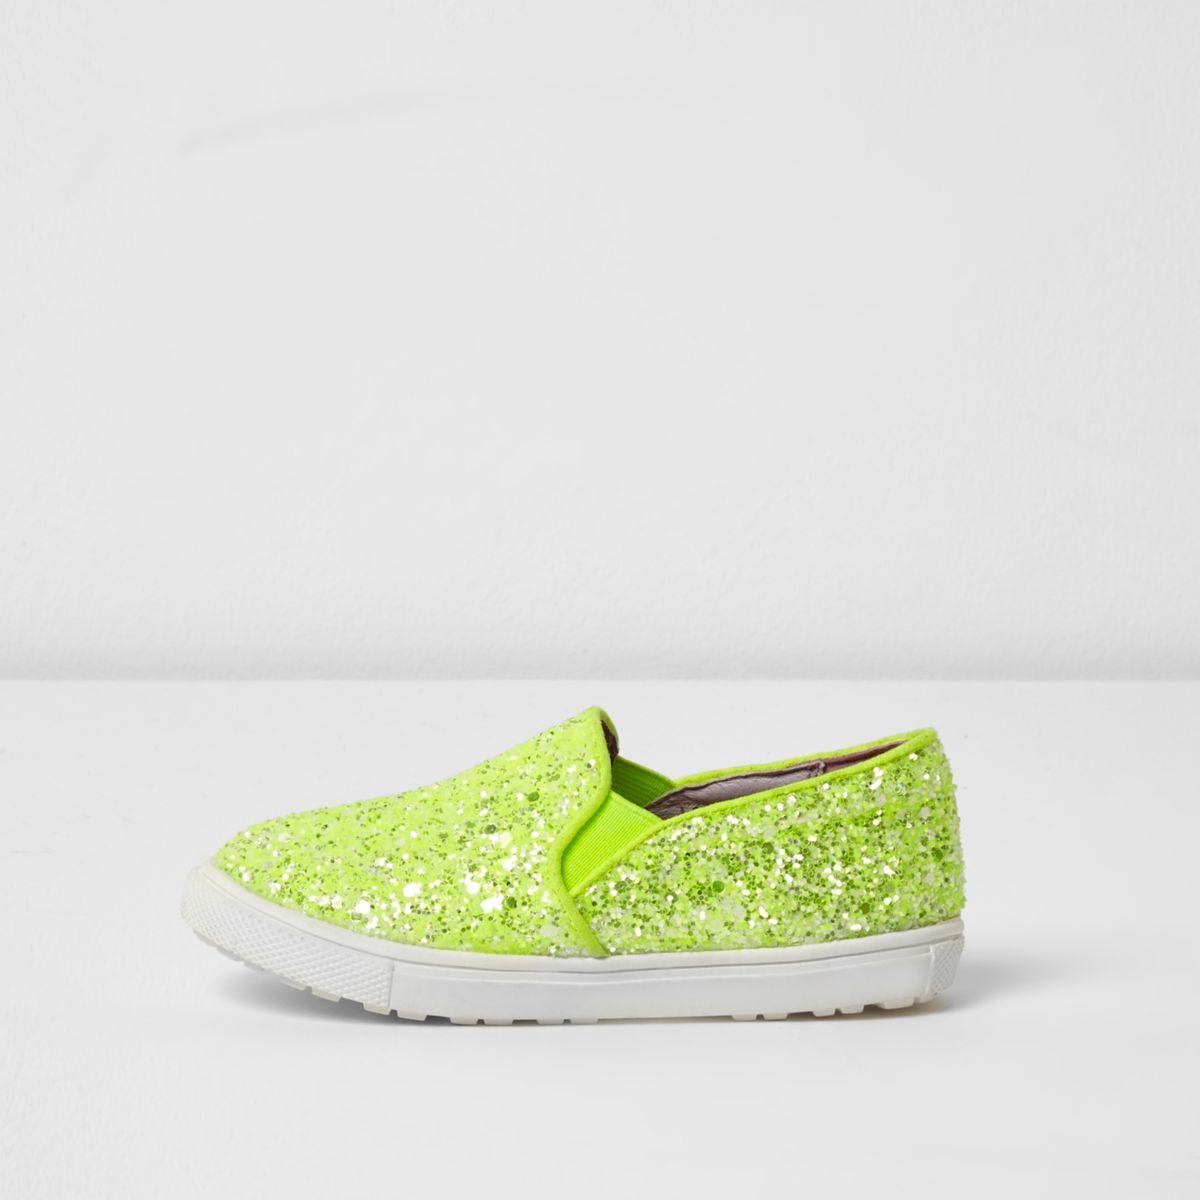 Limettengrüne, silberne Plimsolls